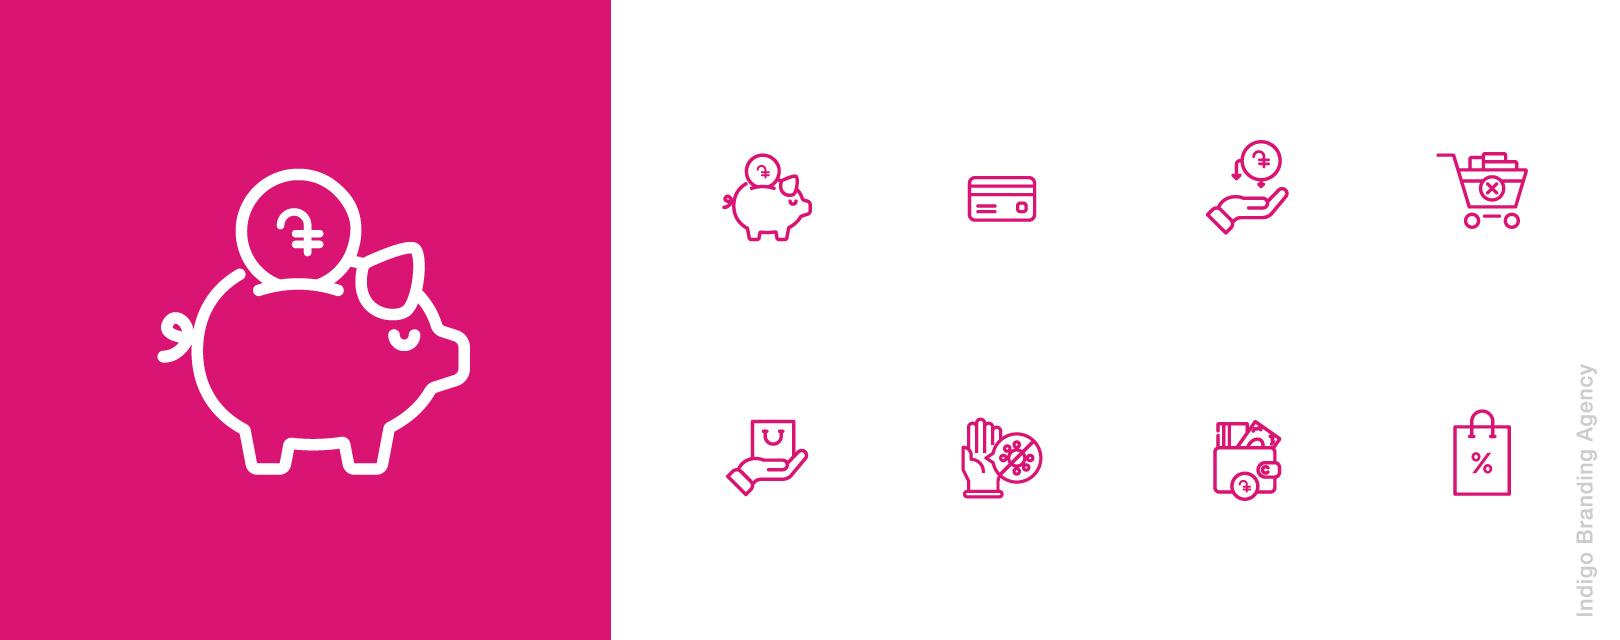 My Finance Month (MFM) branding and logo design by Indigo branding